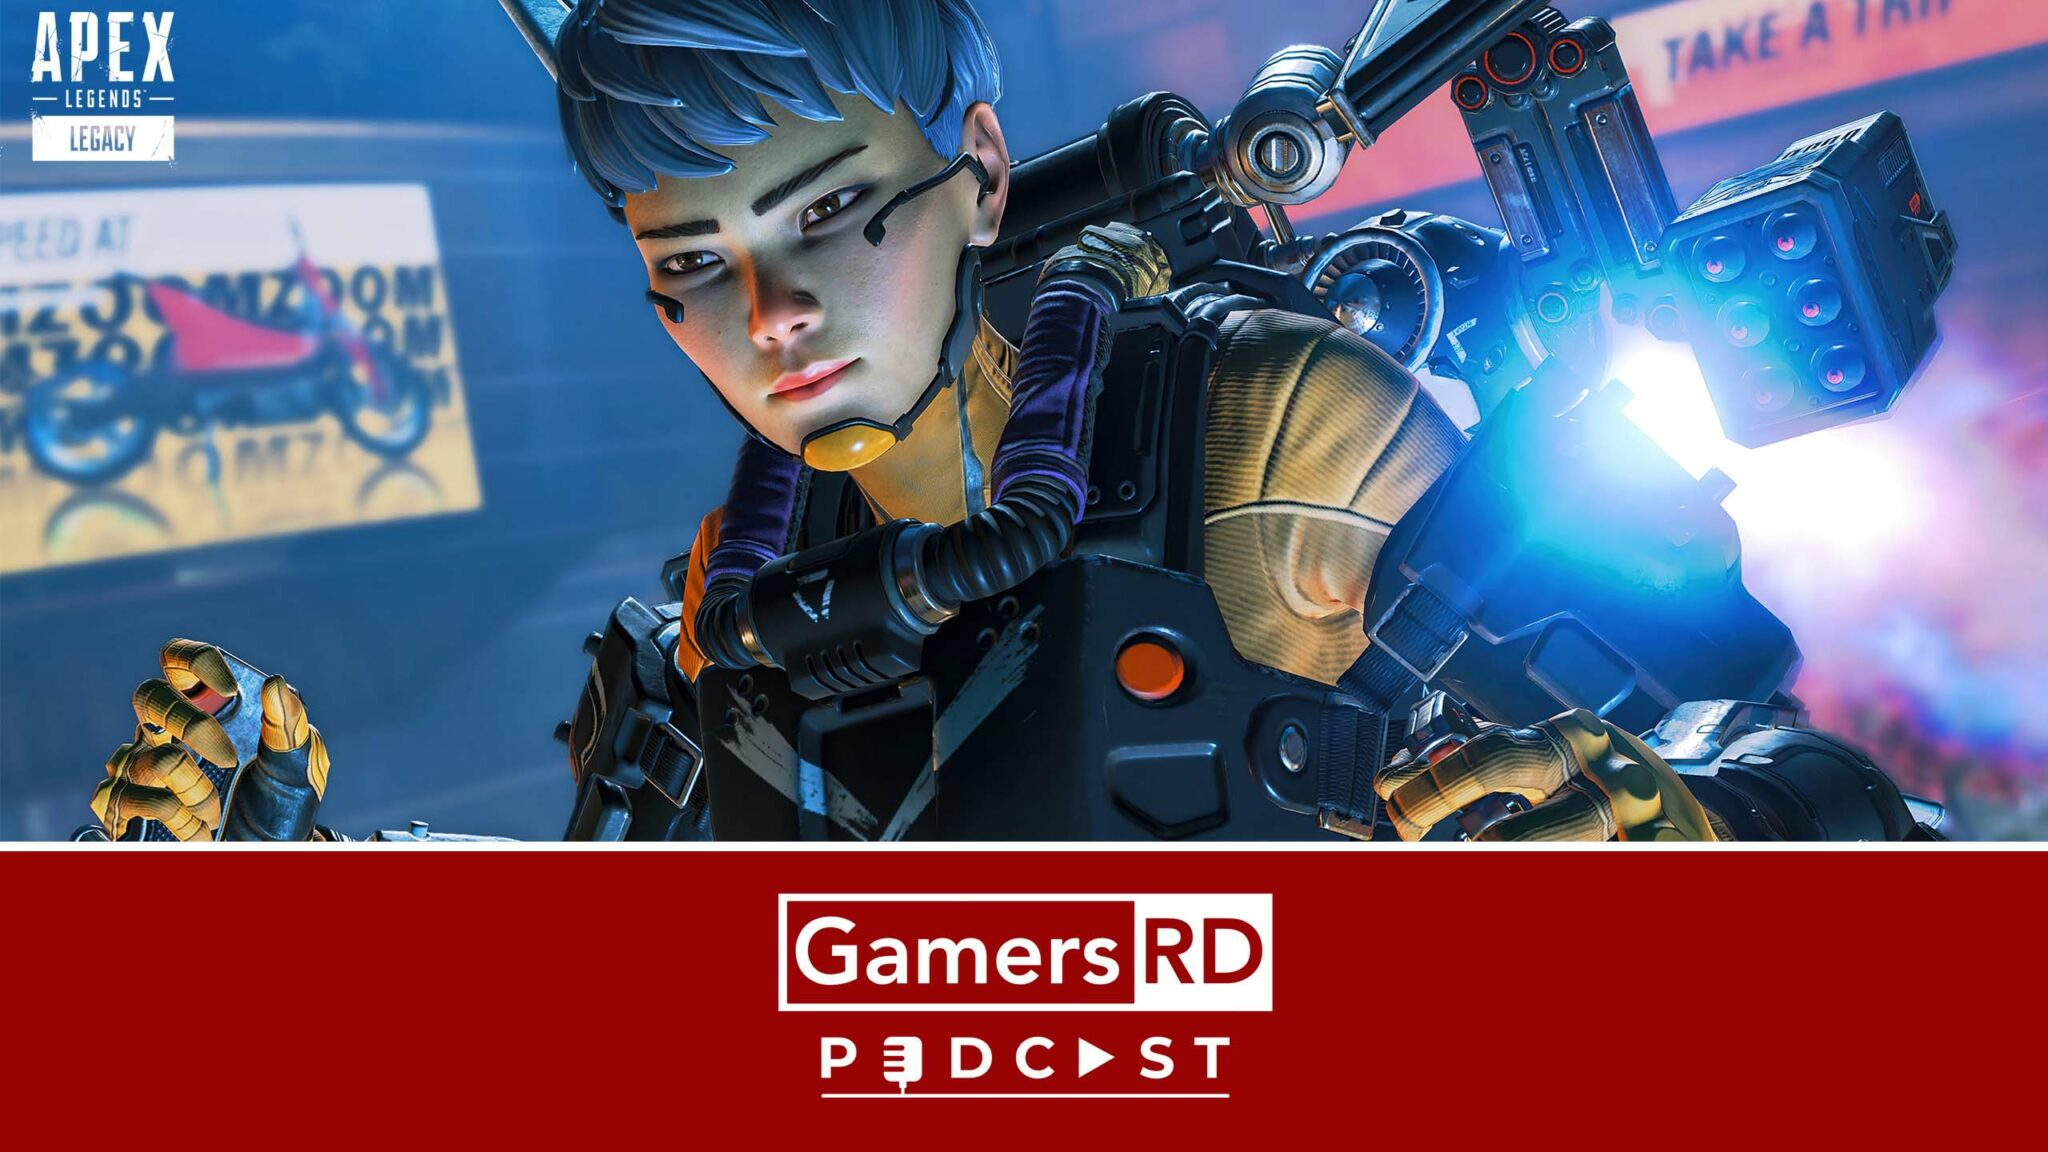 Apex Legends Legacy - Valkyrie GamersRD Podcast